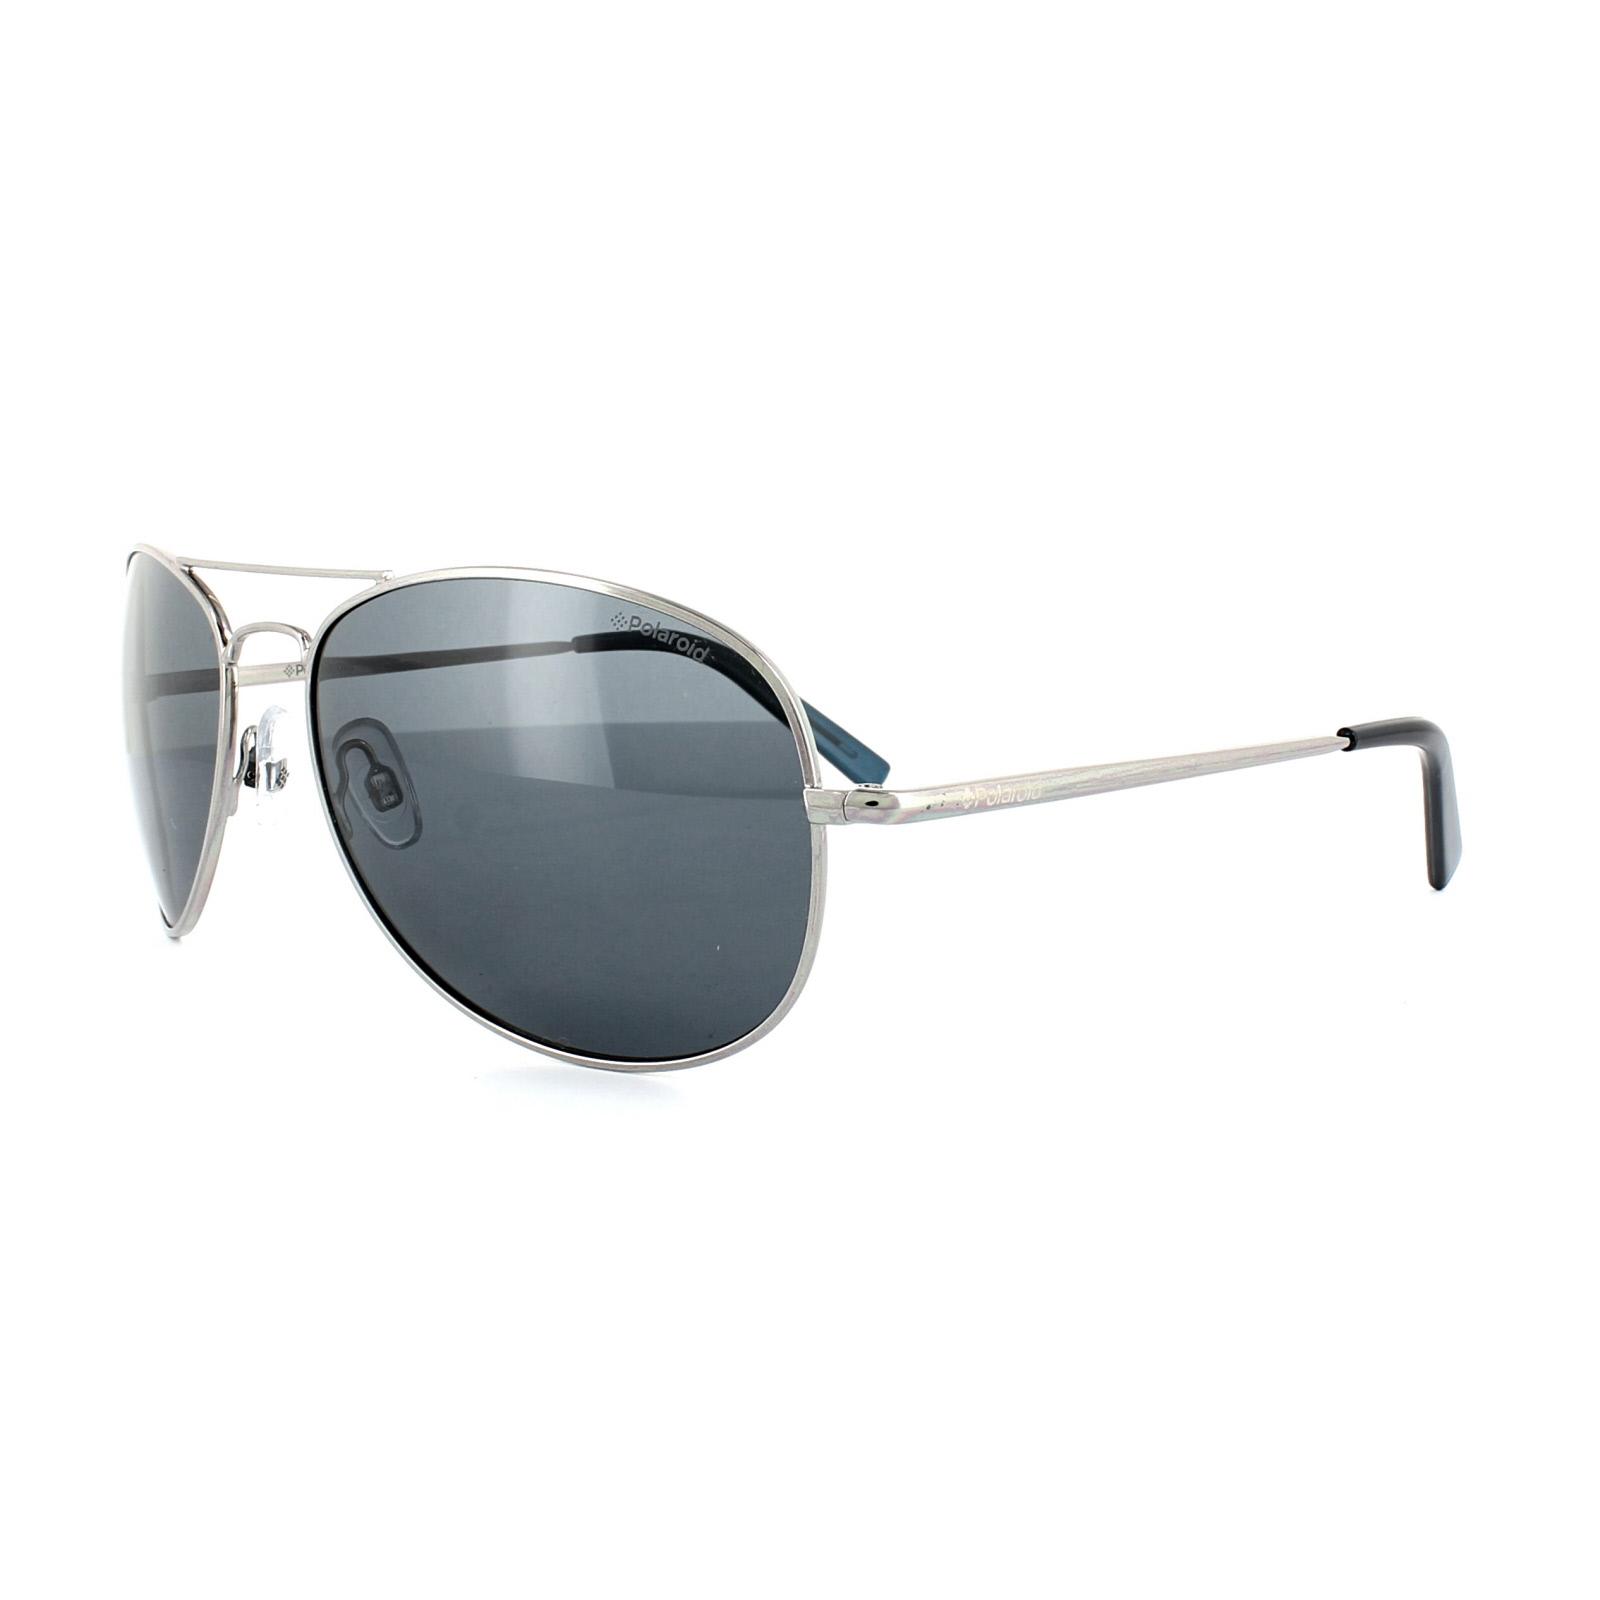 Polaroid PLD 1011S L 003AH Sonnenbrille Damenbrille Herrenbrille Pilotenbrille H7KEv5ZEUS